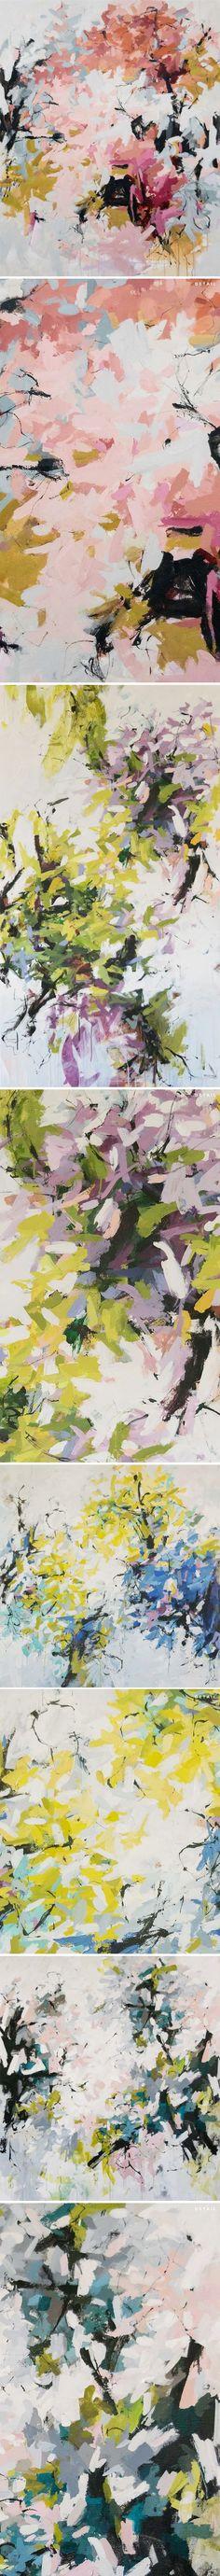 The Jealous Curator /// curated contemporary art /// carlos ramirez #abstractart